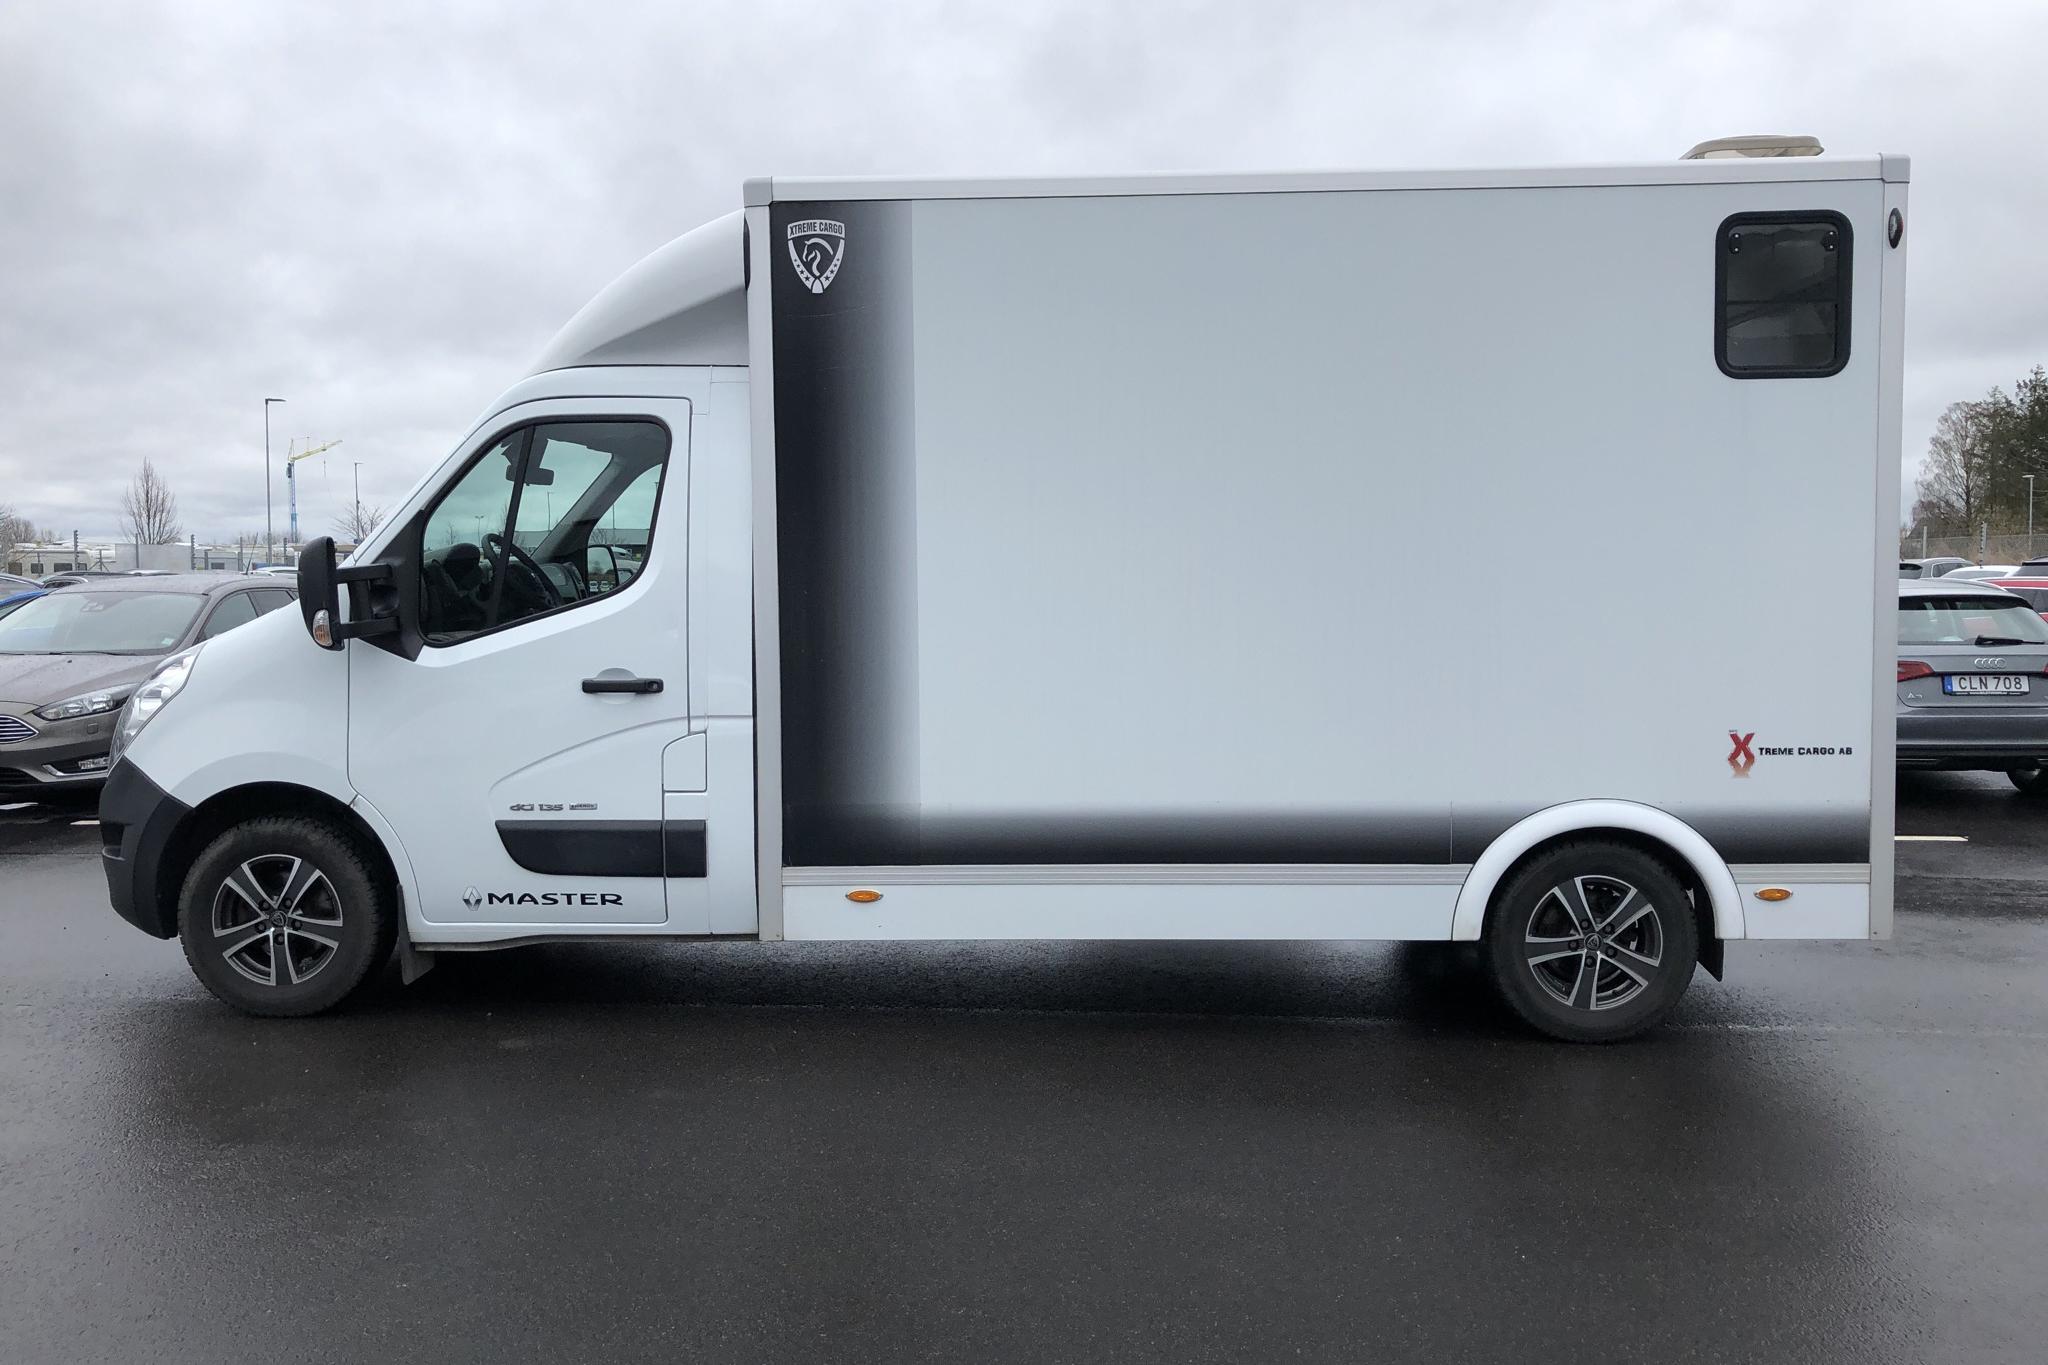 Renault Master 2.3 dCi XTREME CARGO (135hk) Hästtransport - 39 210 km - Manual - white - 2016